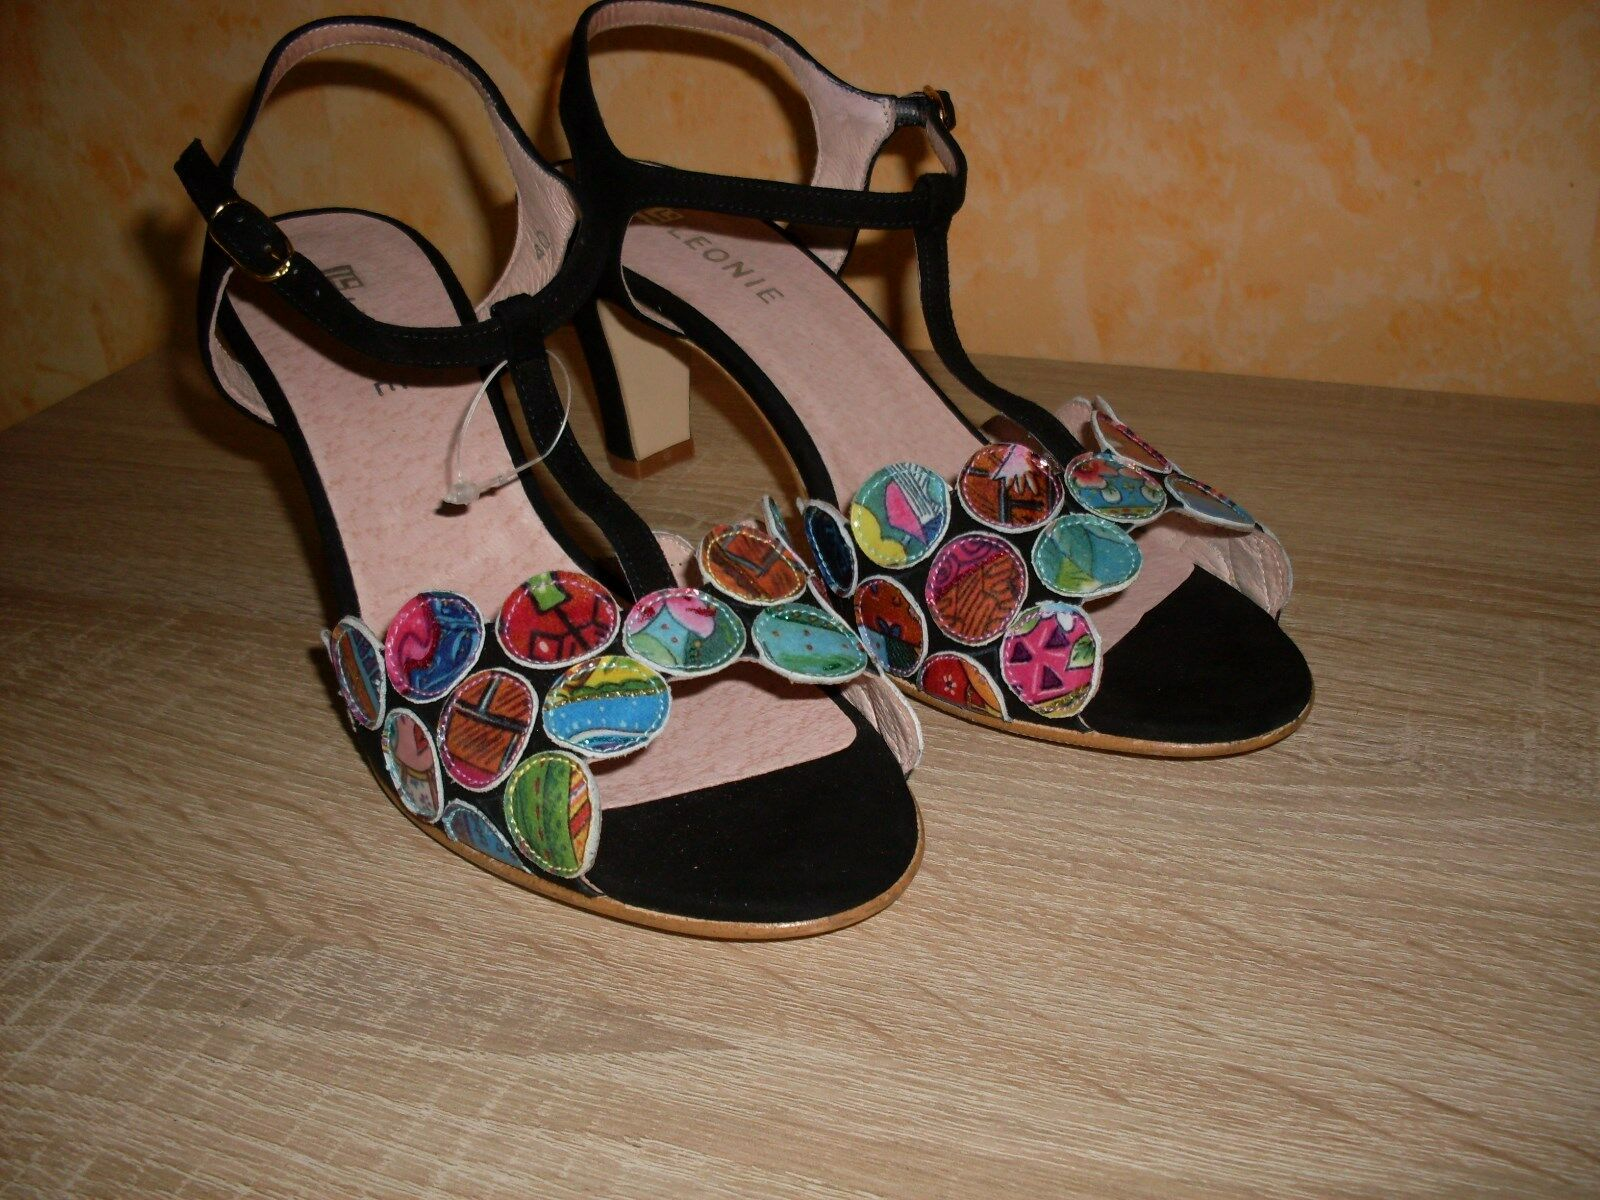 Leonie 40 Sandalette NEU Gr. 40 Leonie in schwarz / bunt & Nubuk Leder ein UNIKAT be85f5